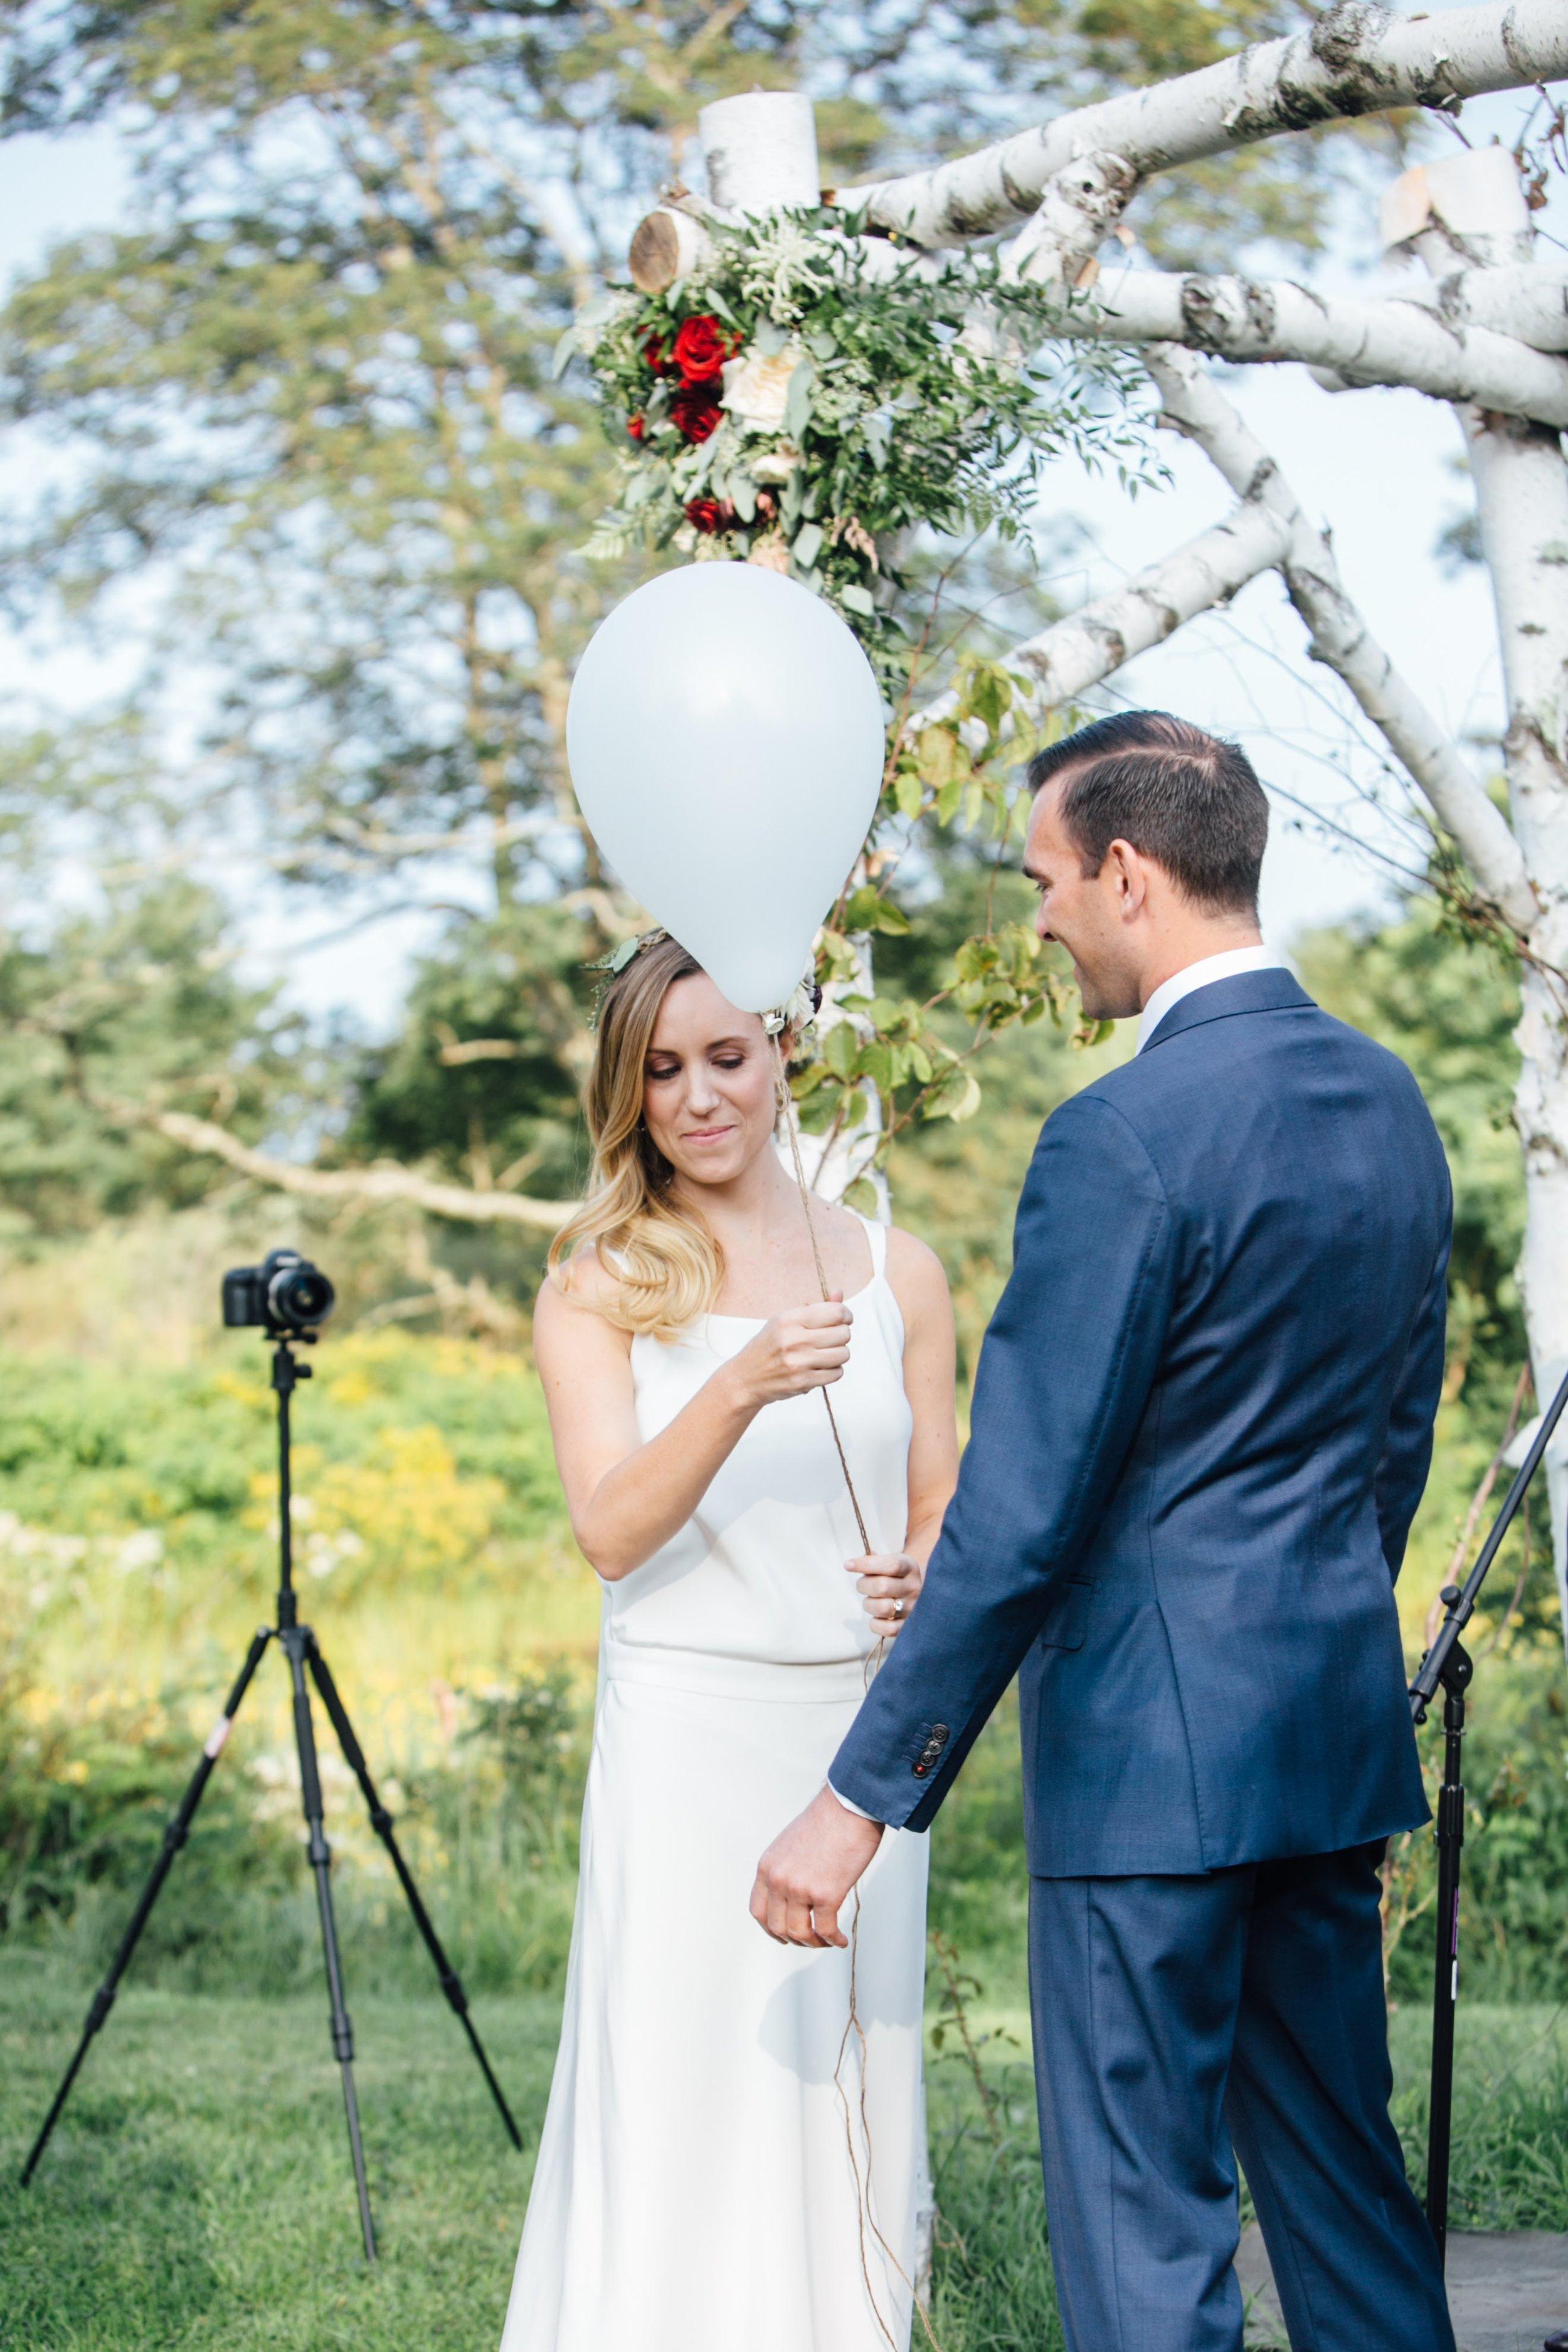 Courtney + Matt Blenheim Hill Farm Catskills NY Wedding Veronica Lola Photography 2017-390.jpg